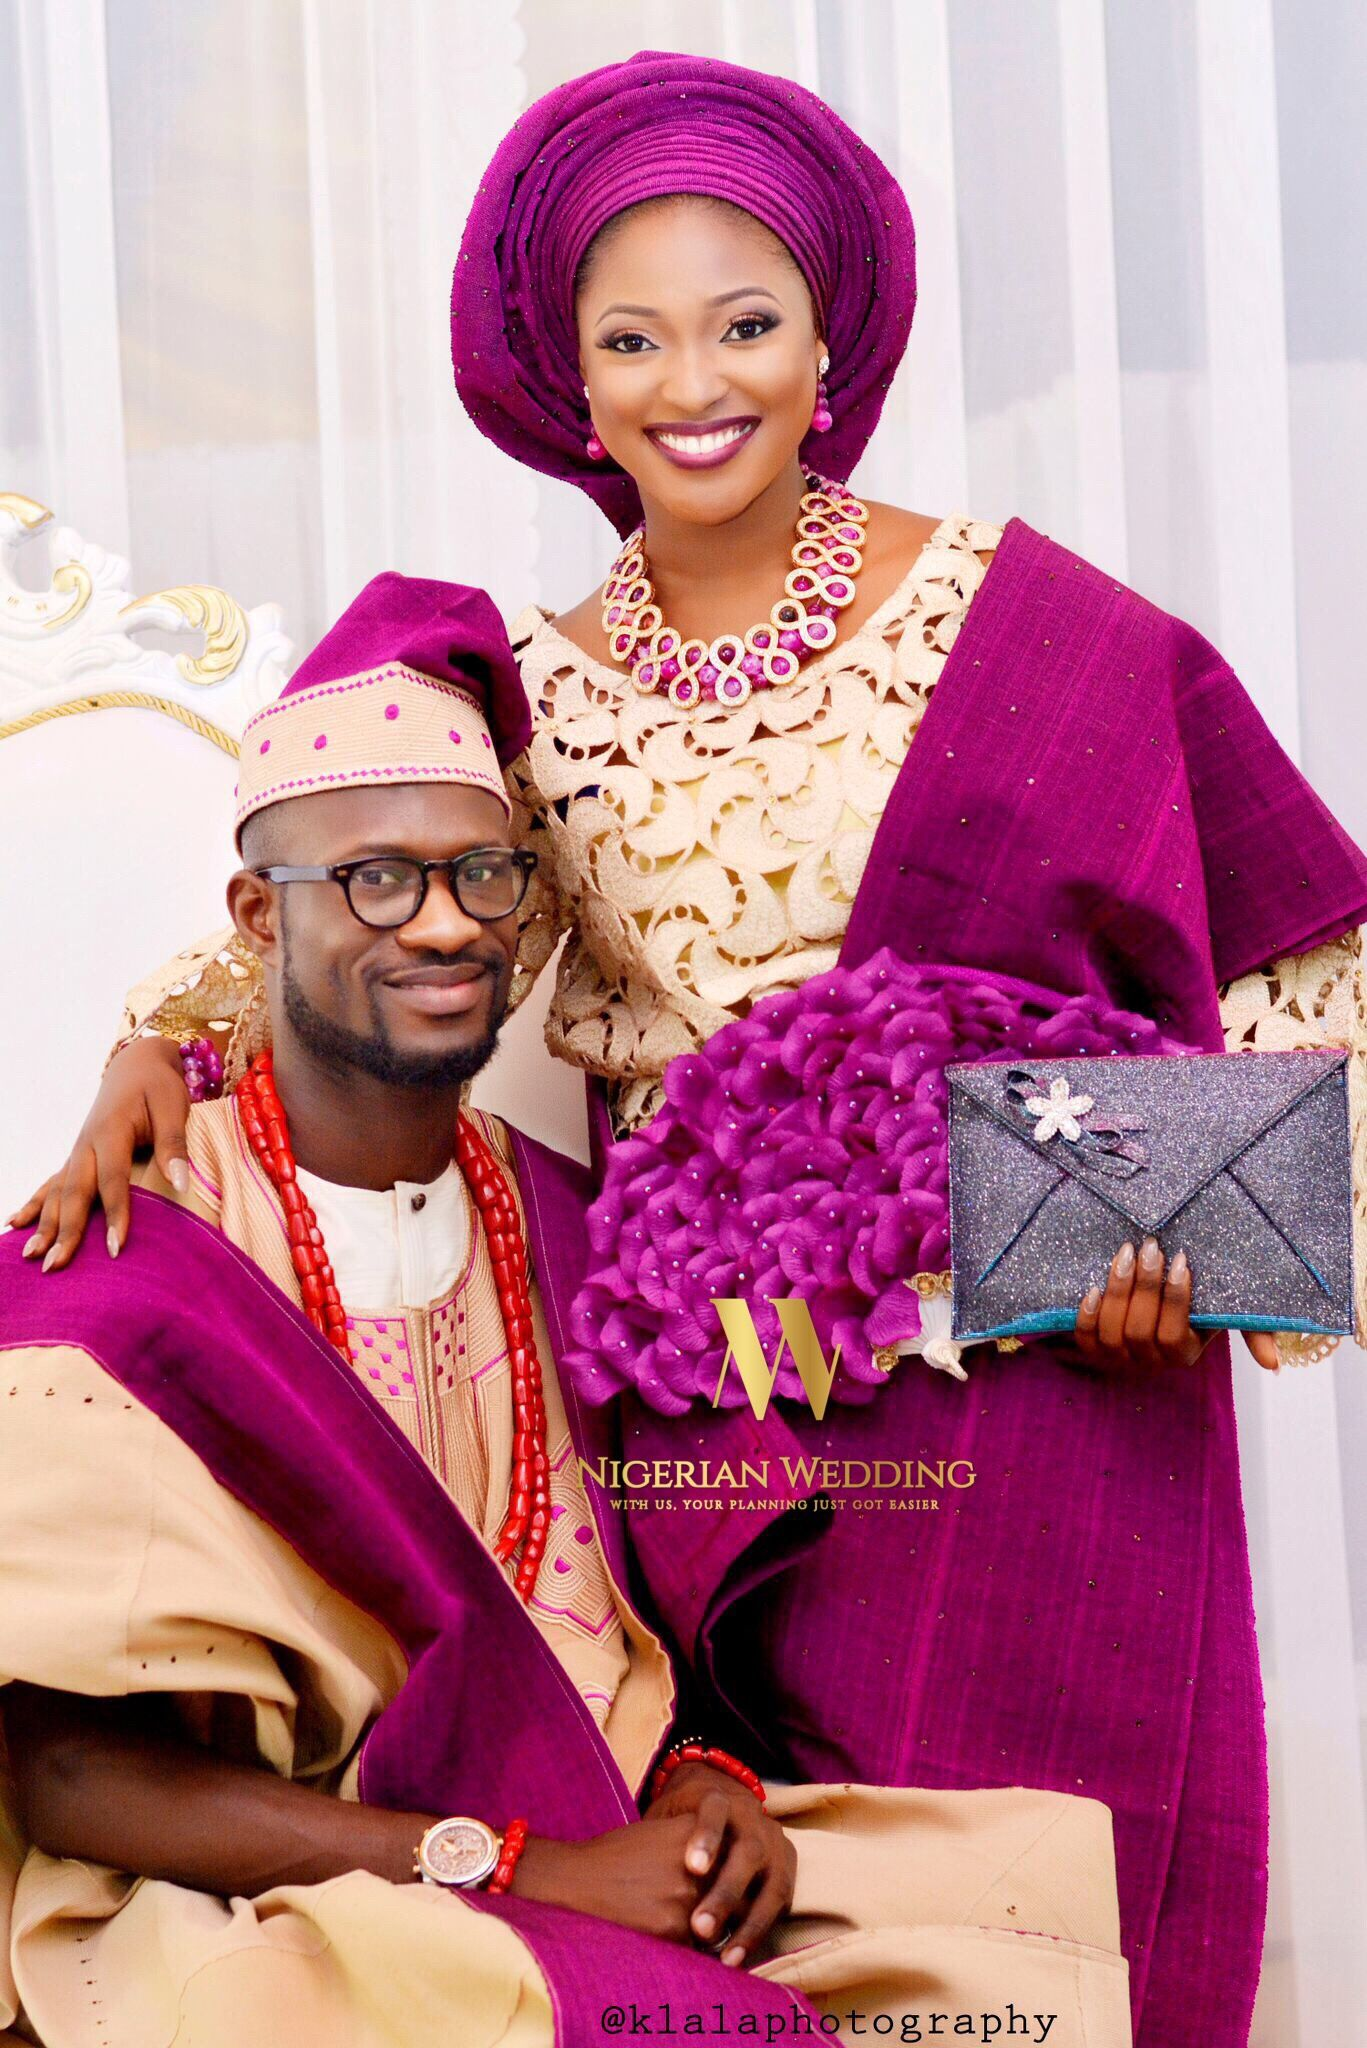 Nigerian Wedding Presents The Stunningly Colourful Wedding Ceremony ...